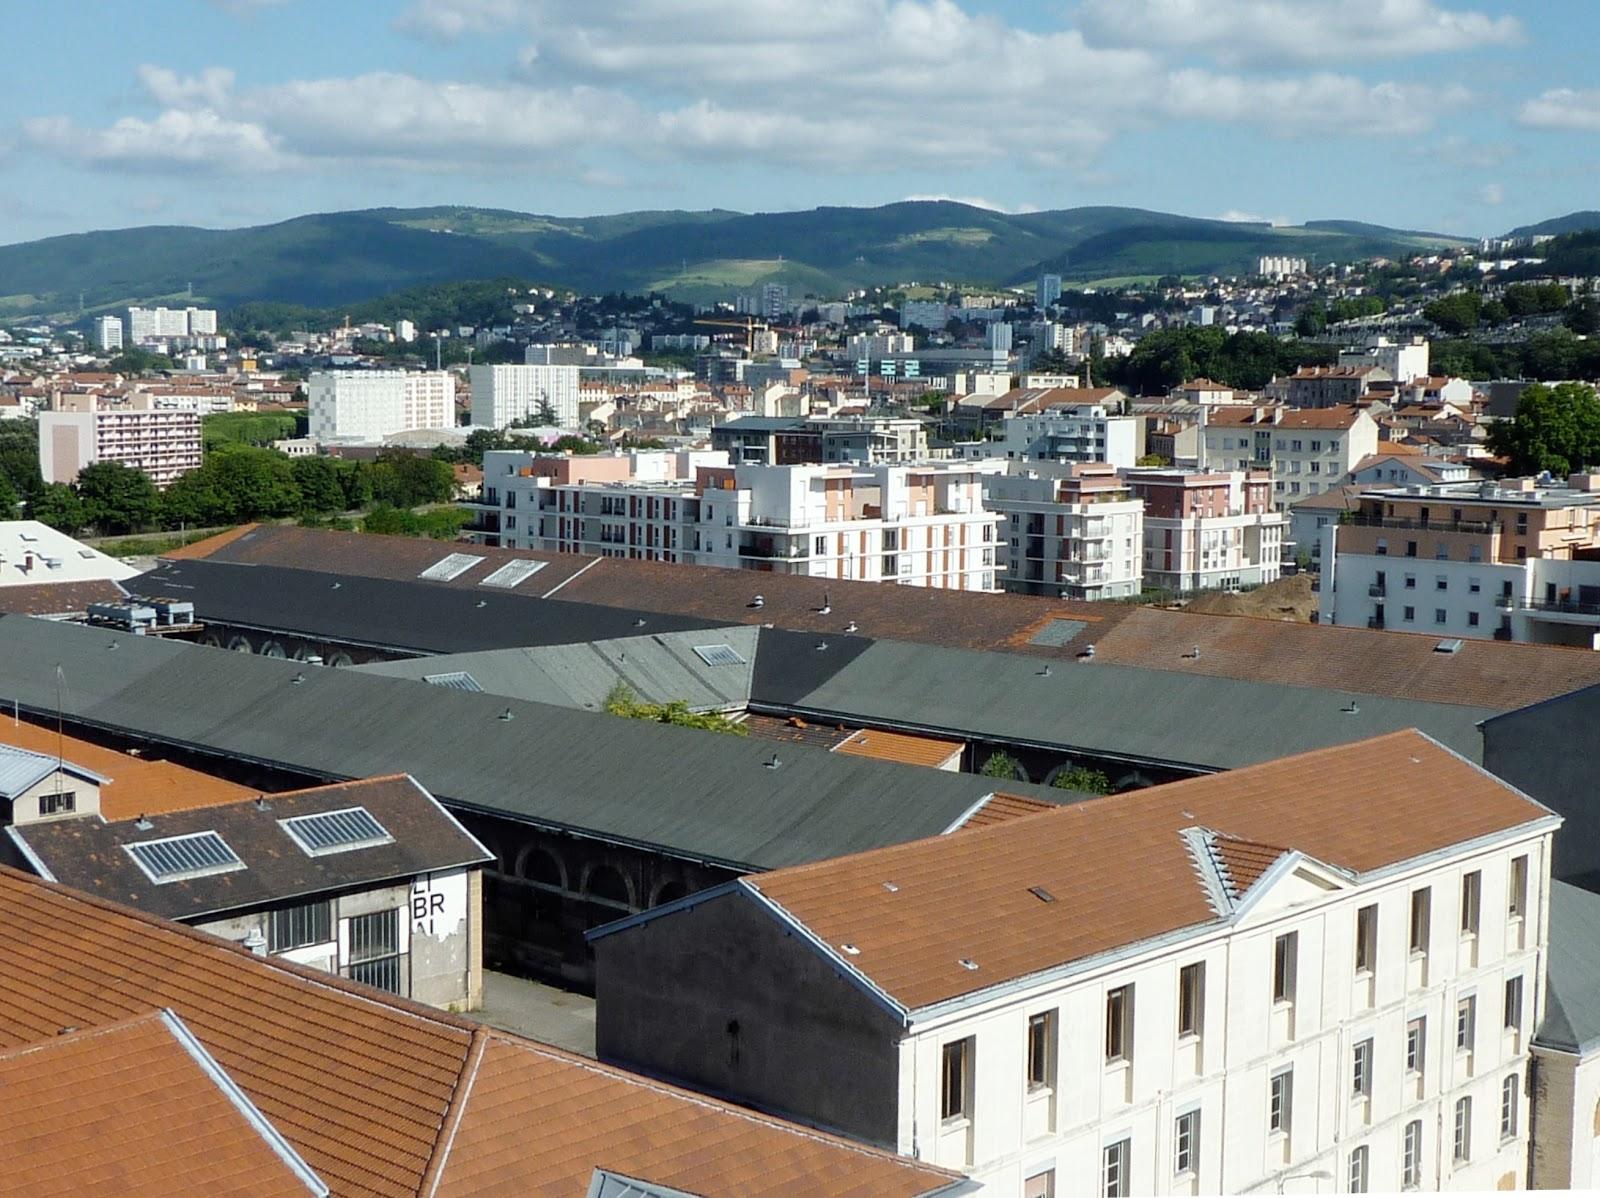 As Saint-Г©tienne